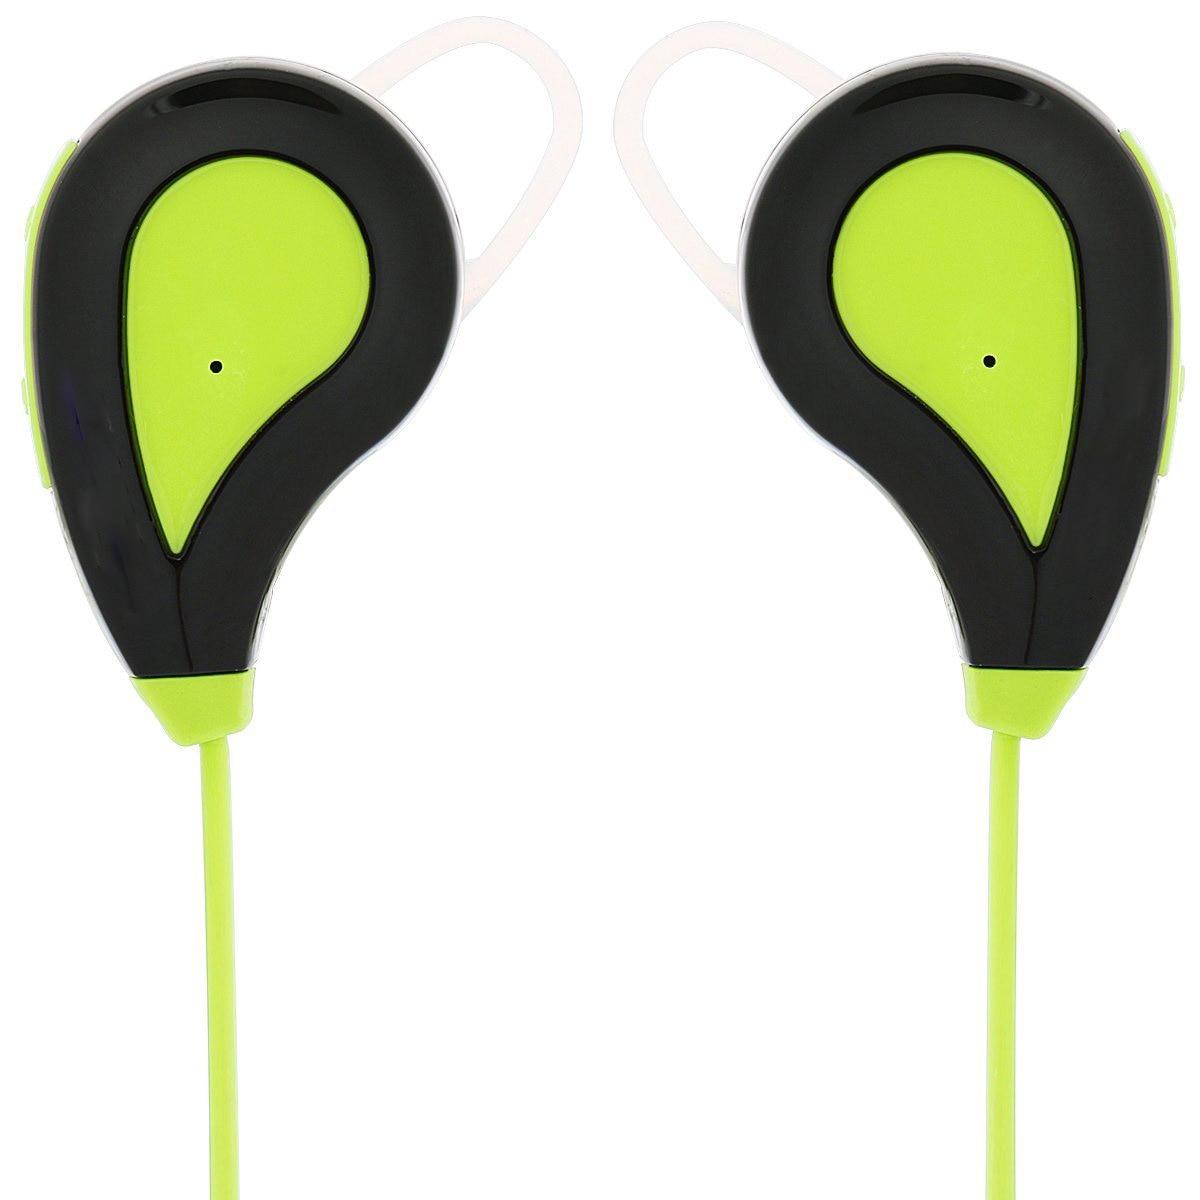 Bluetooth Wireless Stereo Headset Studio Music Handsfree Sweatproof Running Earbud Earphone for IPhone Samsung With Mic